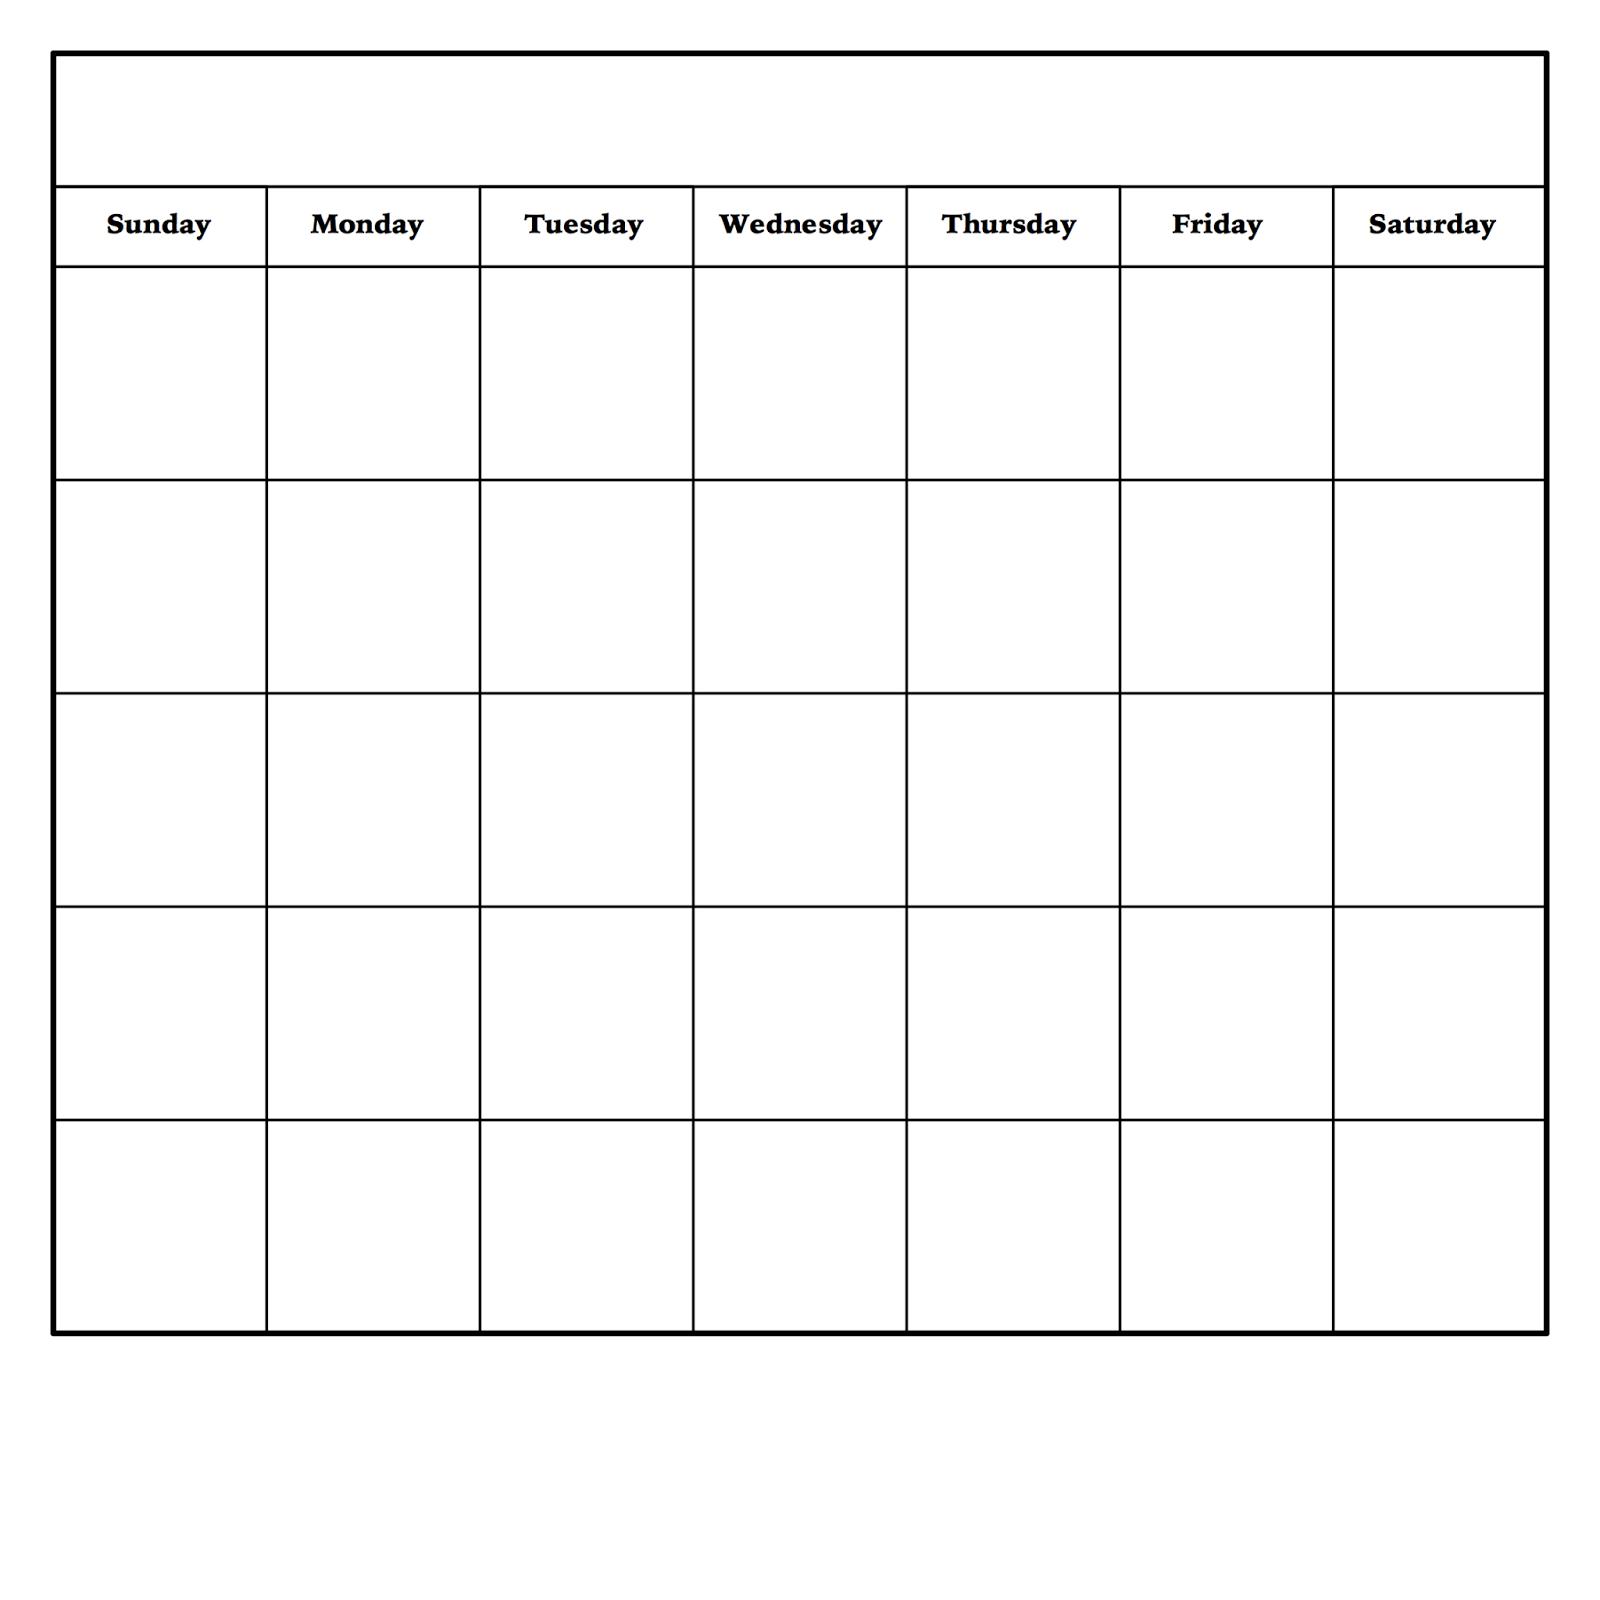 Diy Dry Erase Calendar | Листы | Календарь, Дизайн И Органайзер with regard to Blank Monthly Calender